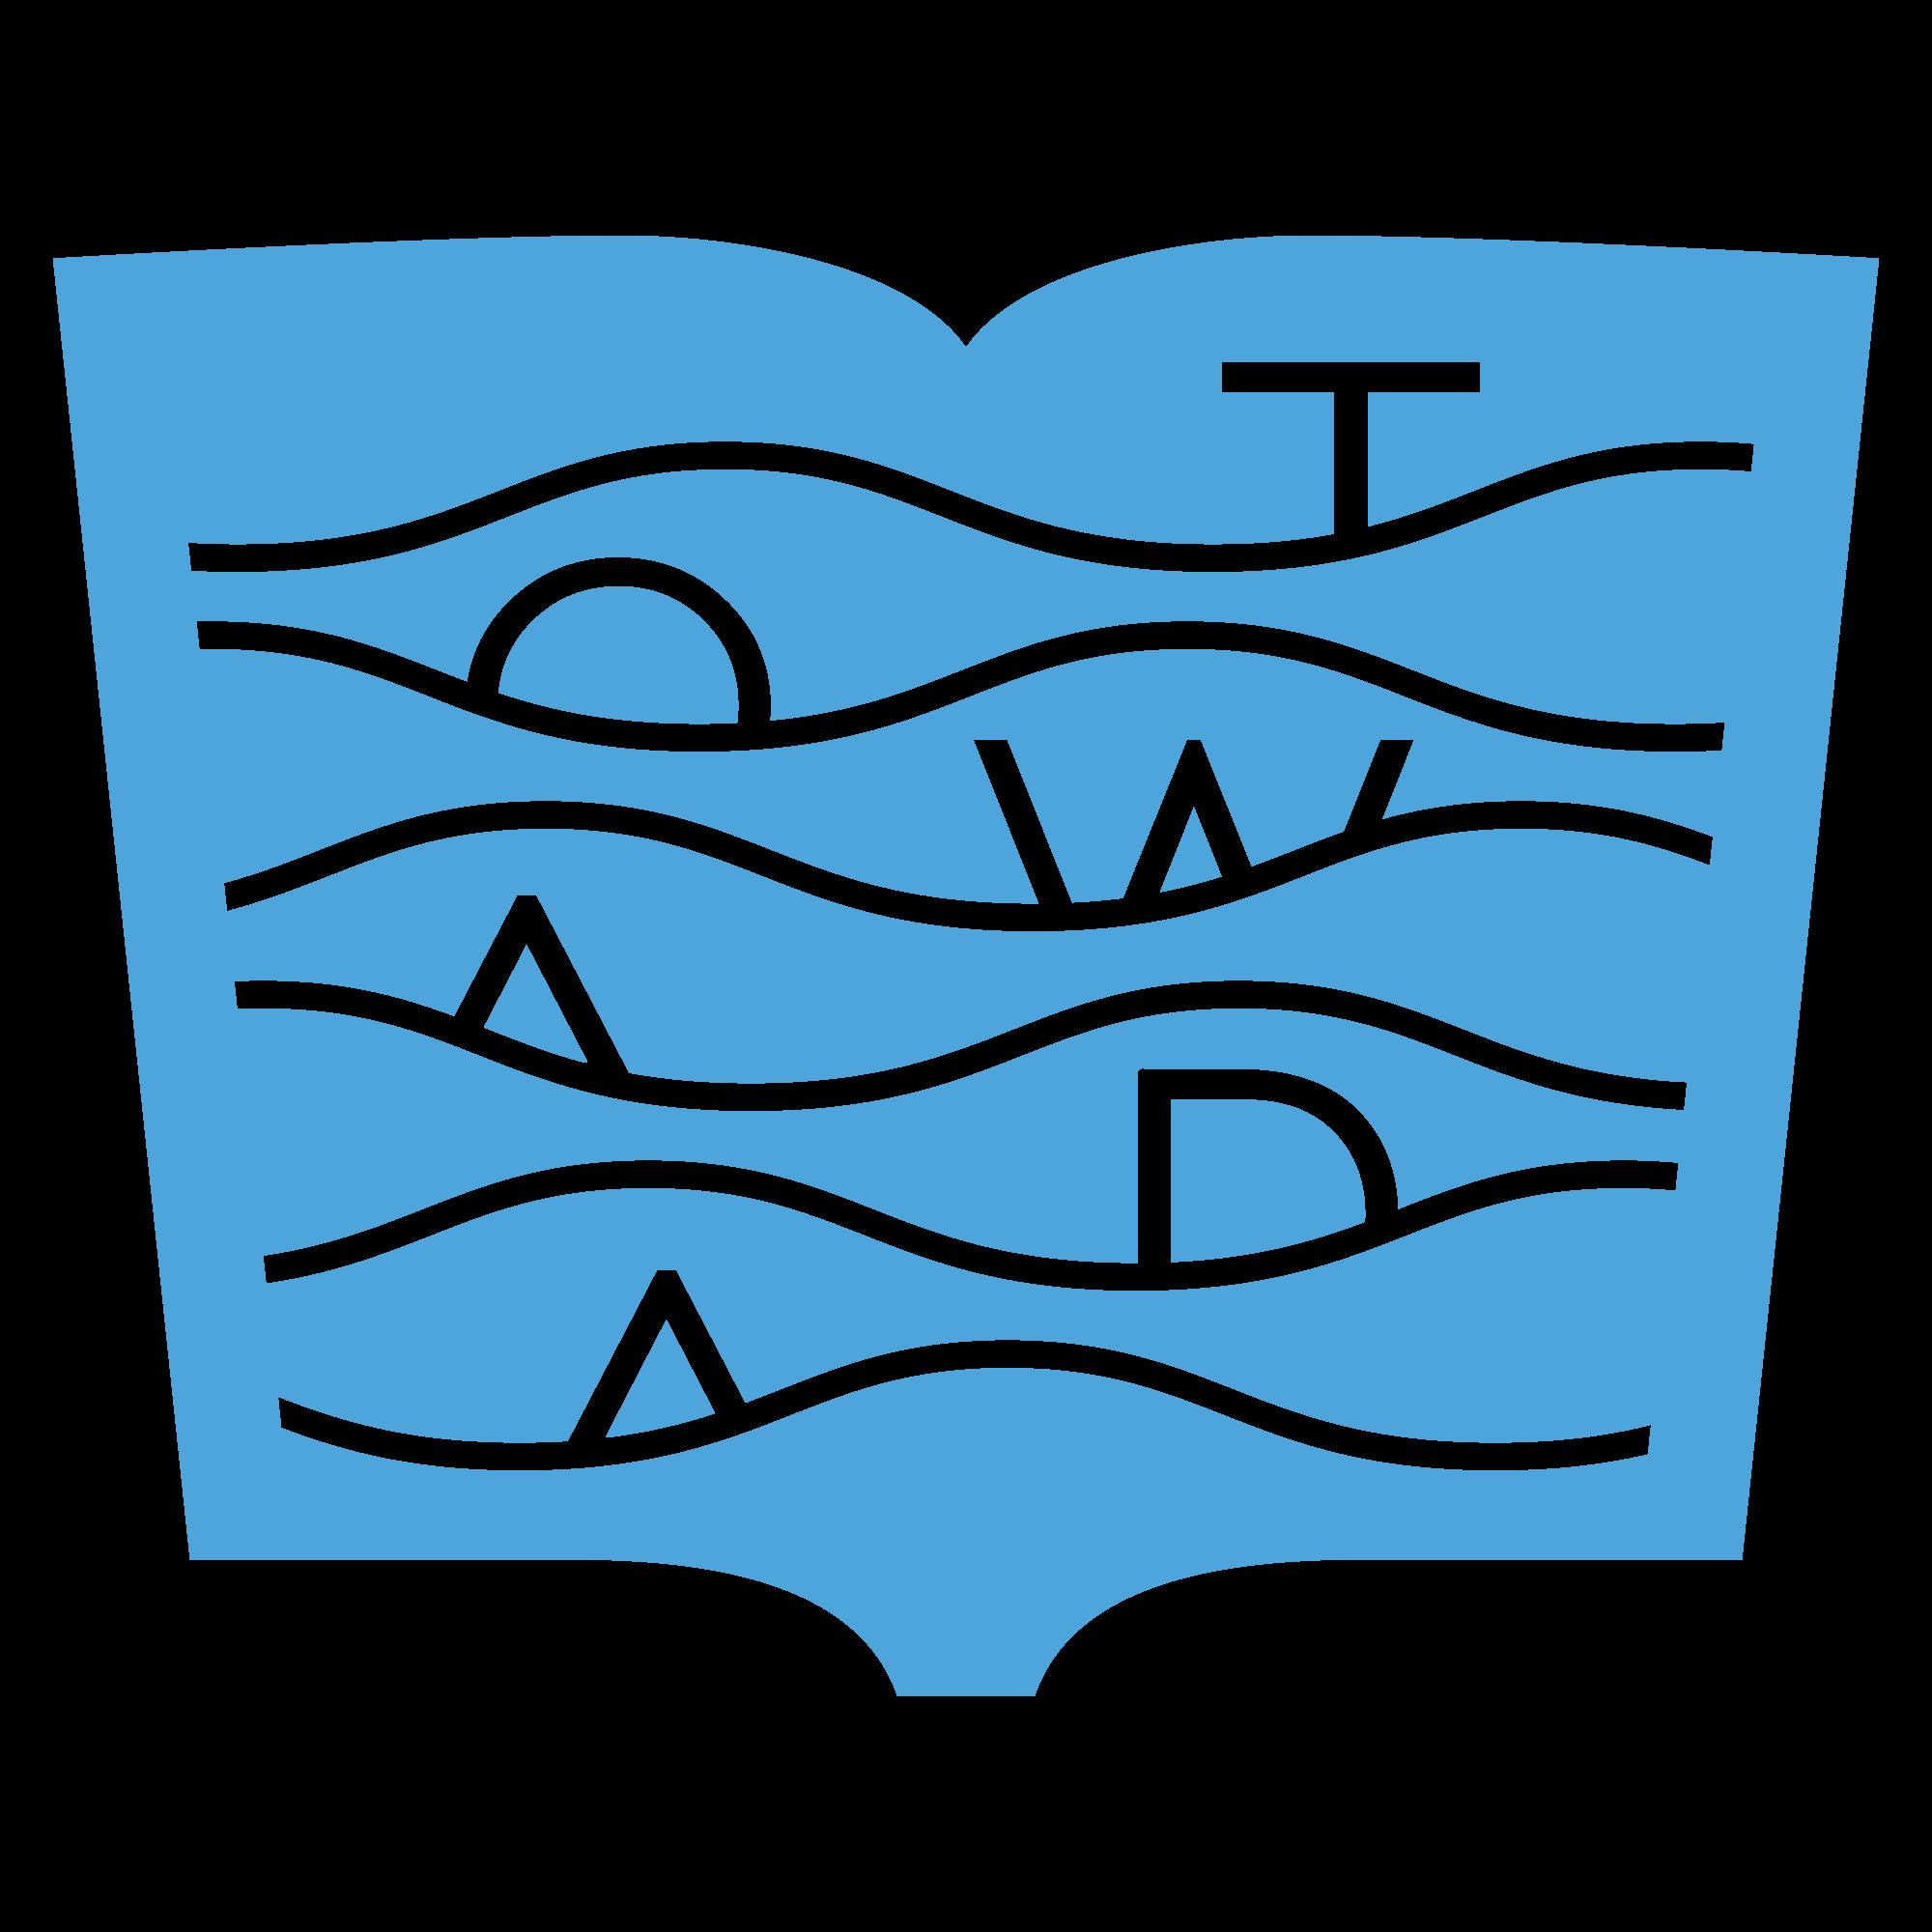 Host image